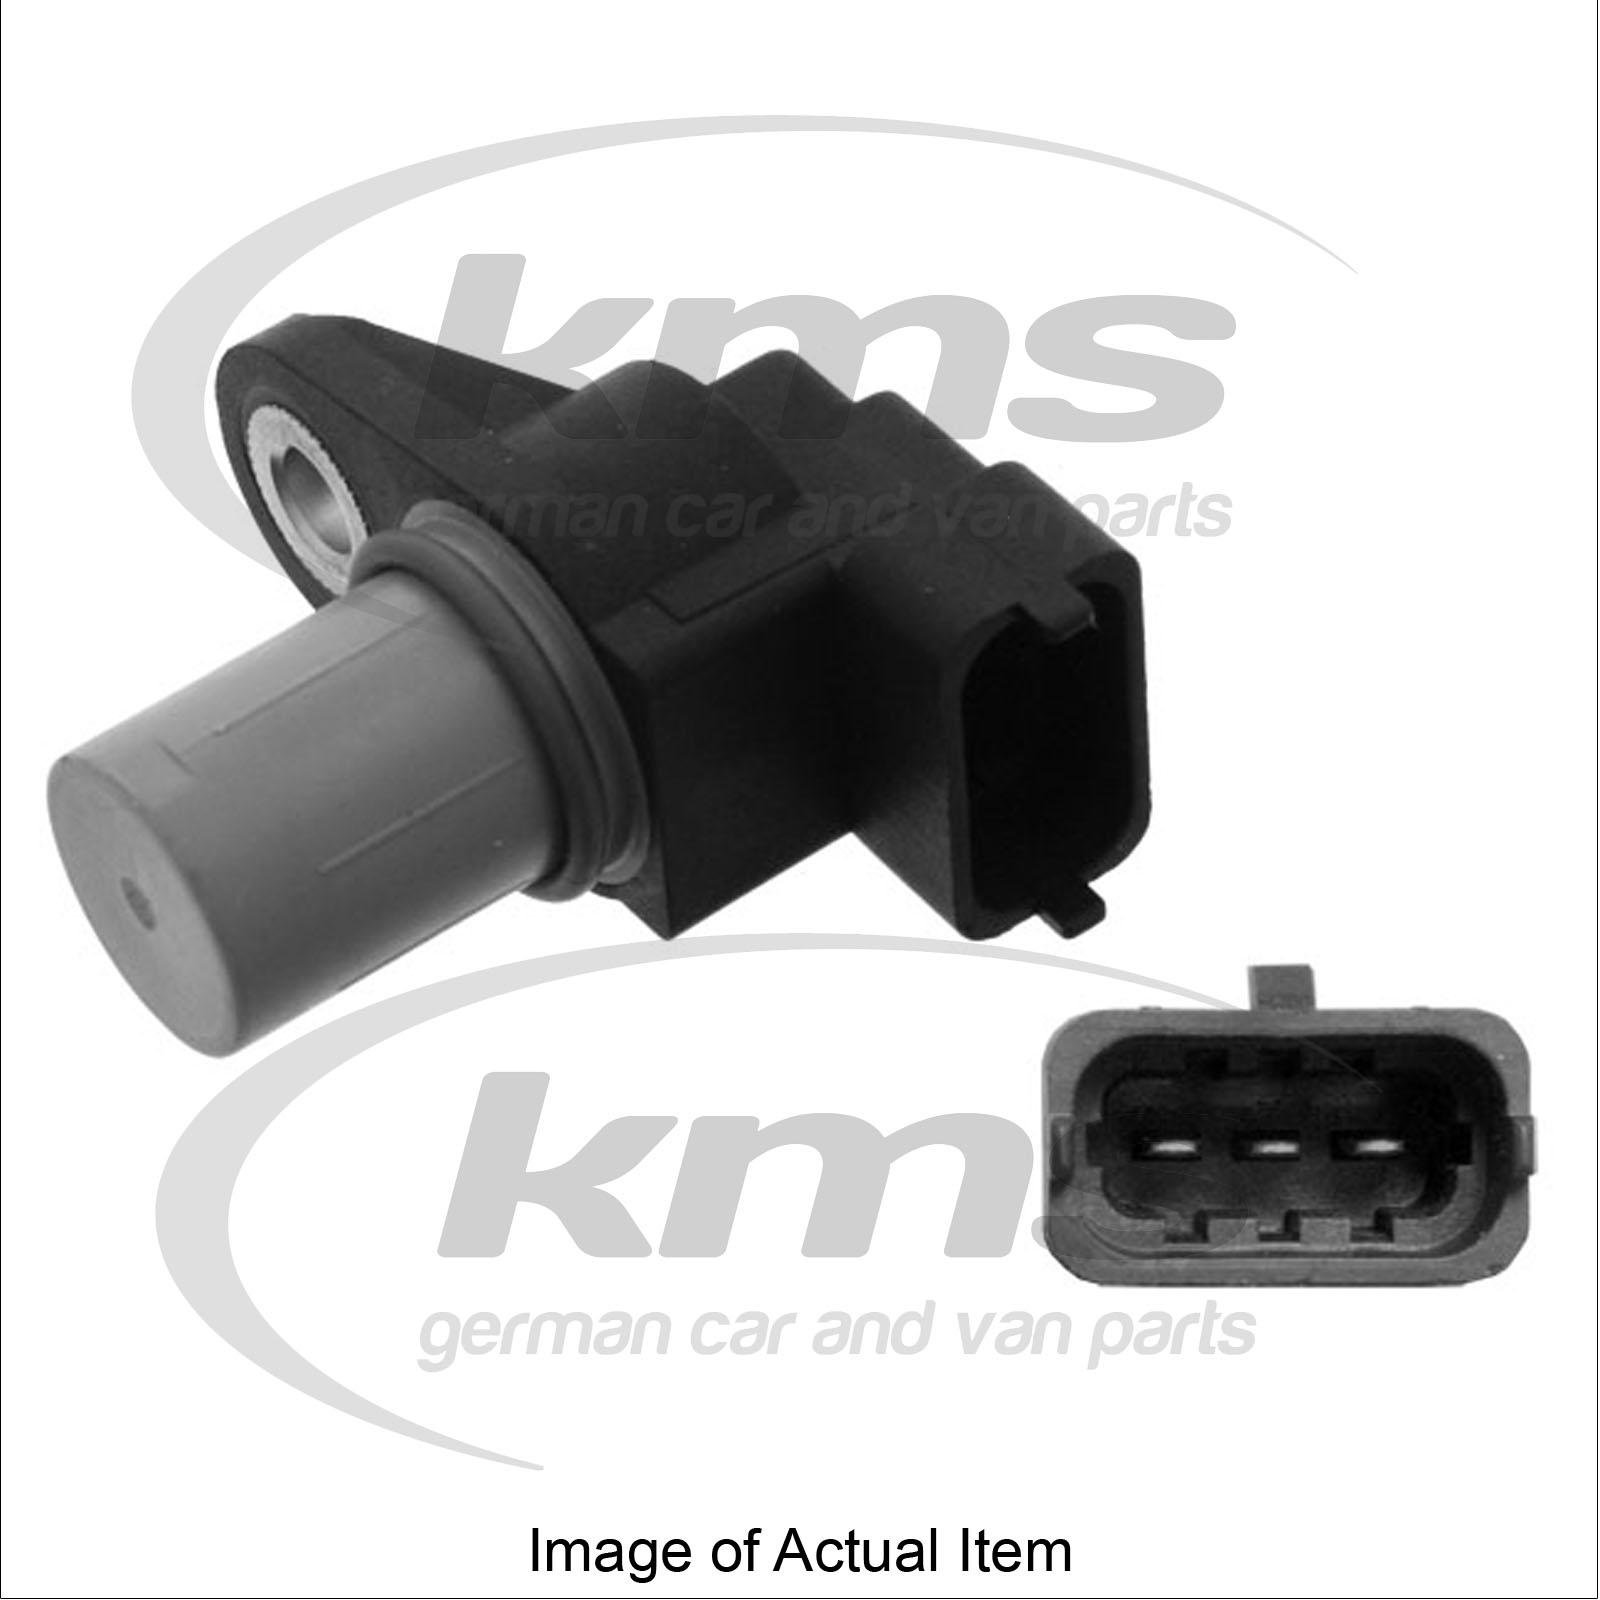 camshaft position sensor mercedes benz clk class coupe